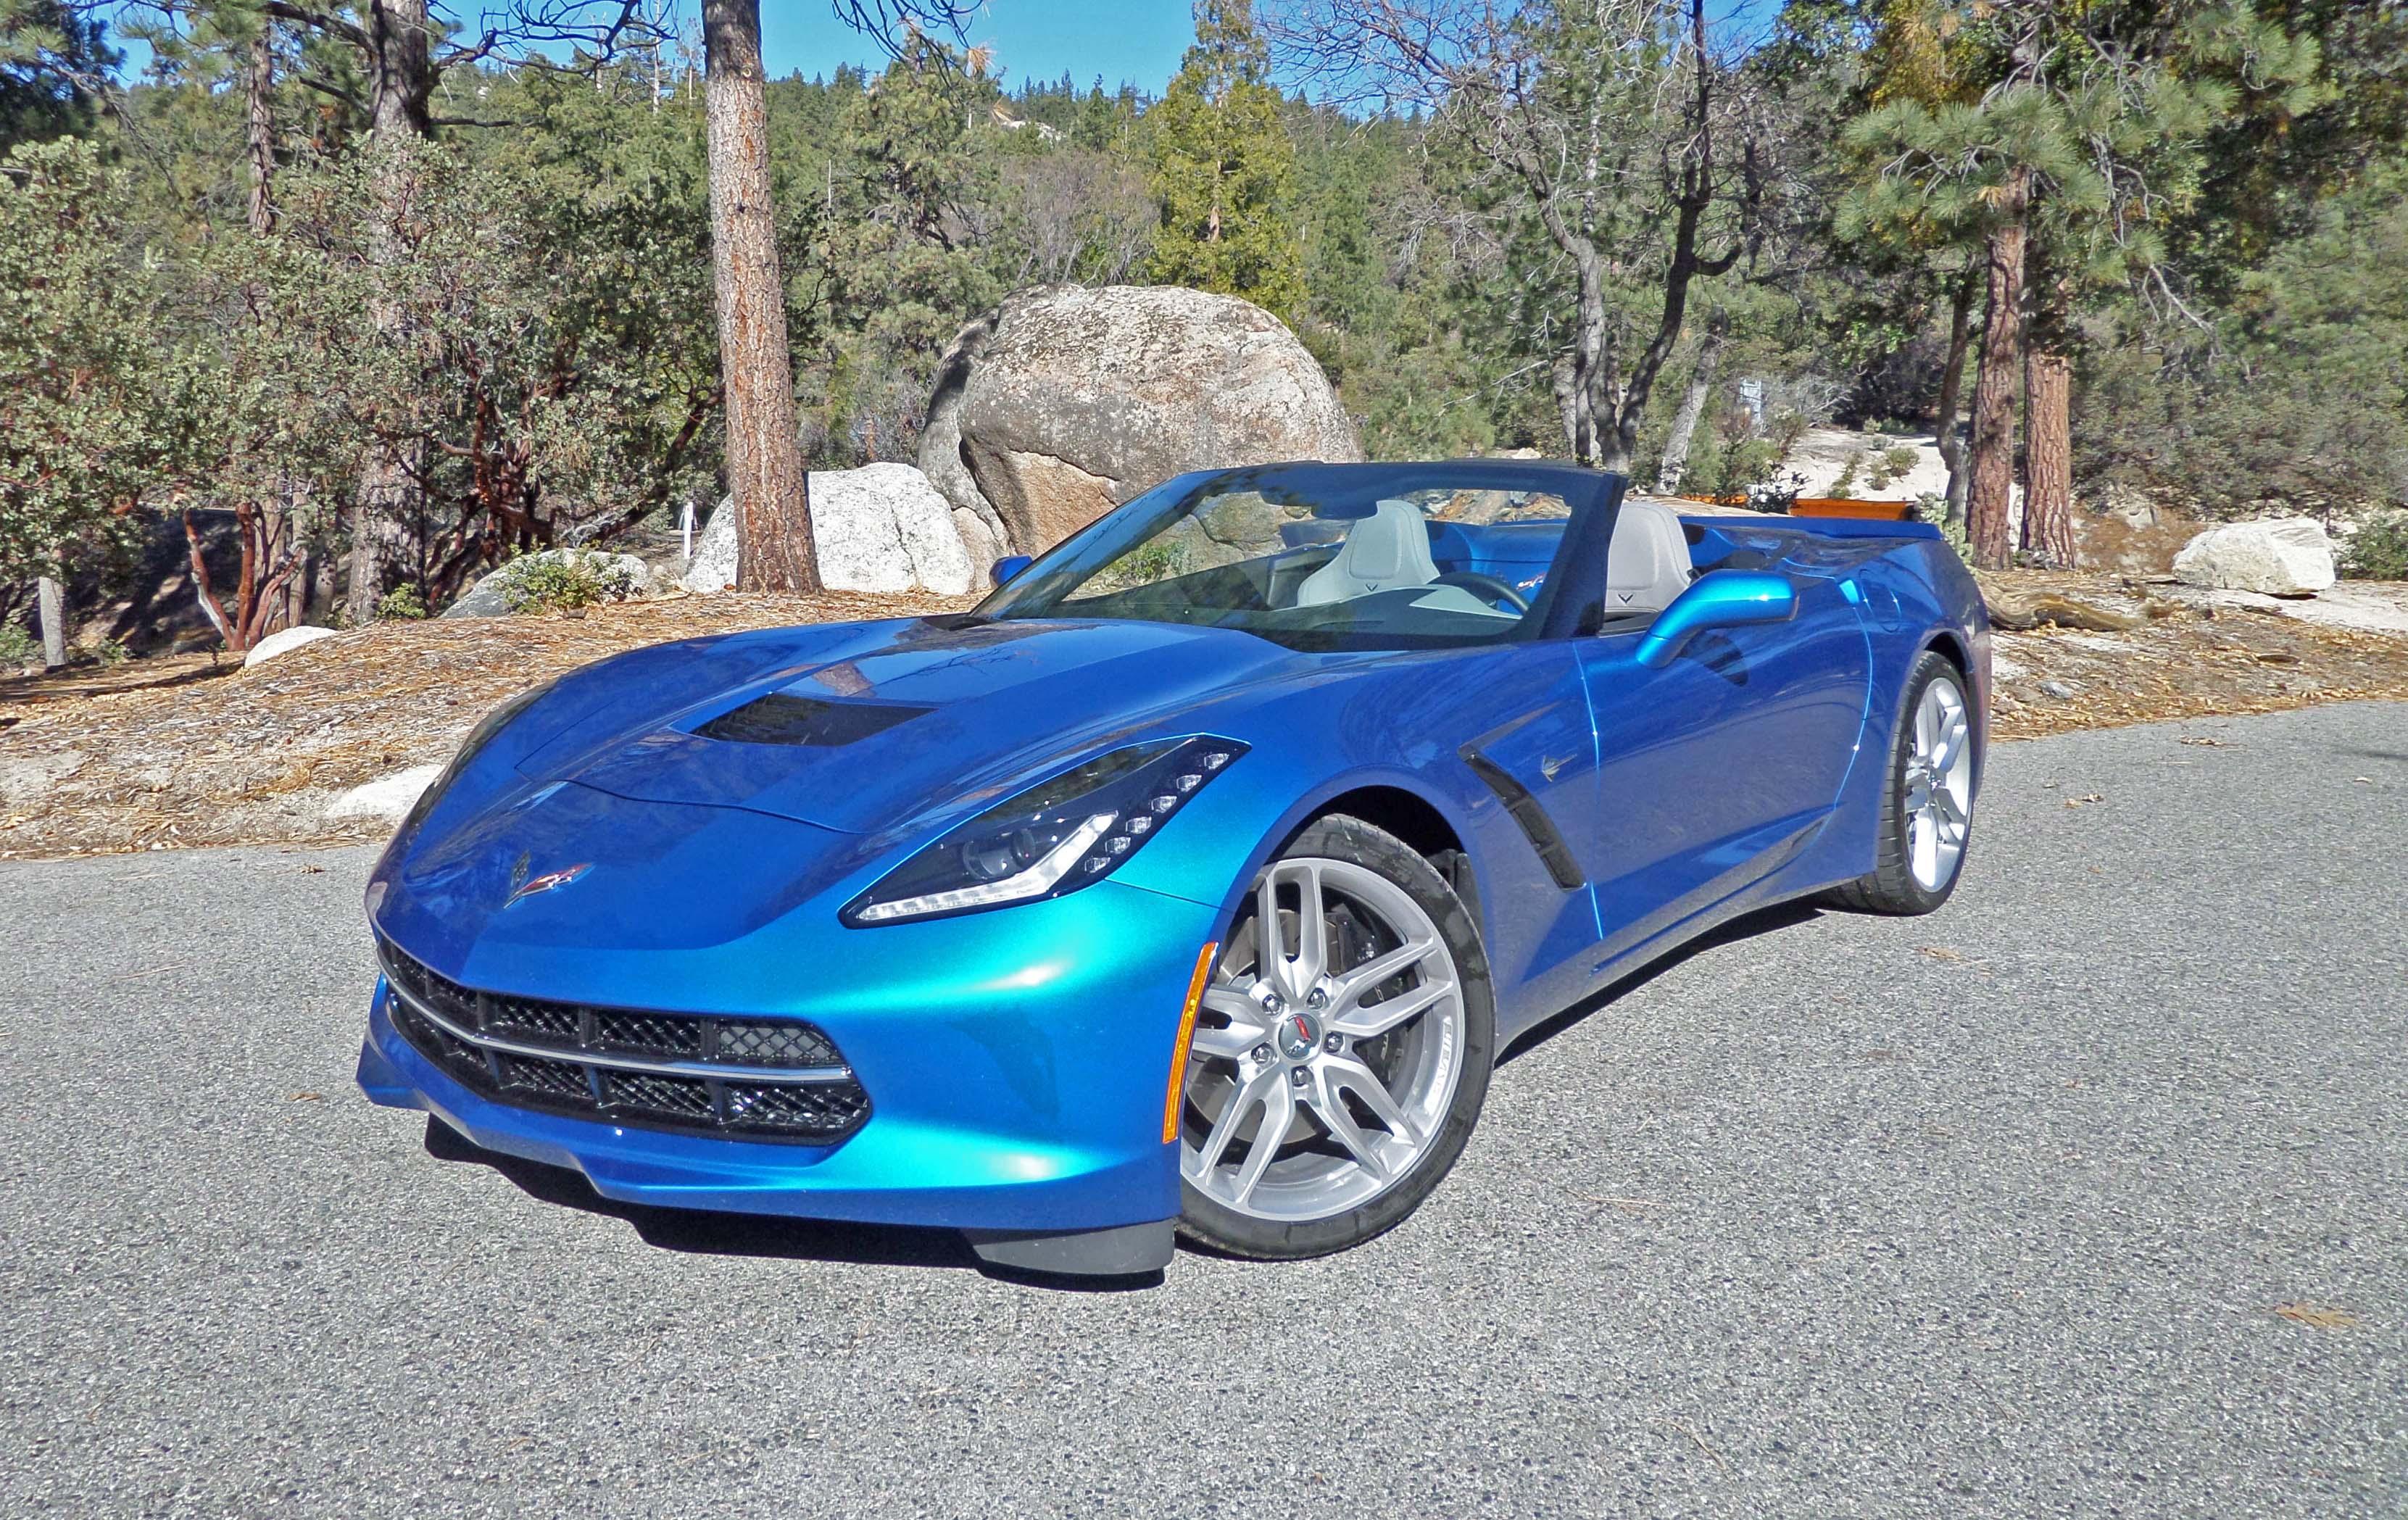 2014 Chevrolet Corvette Stingray Convertible Test Drivenbsp